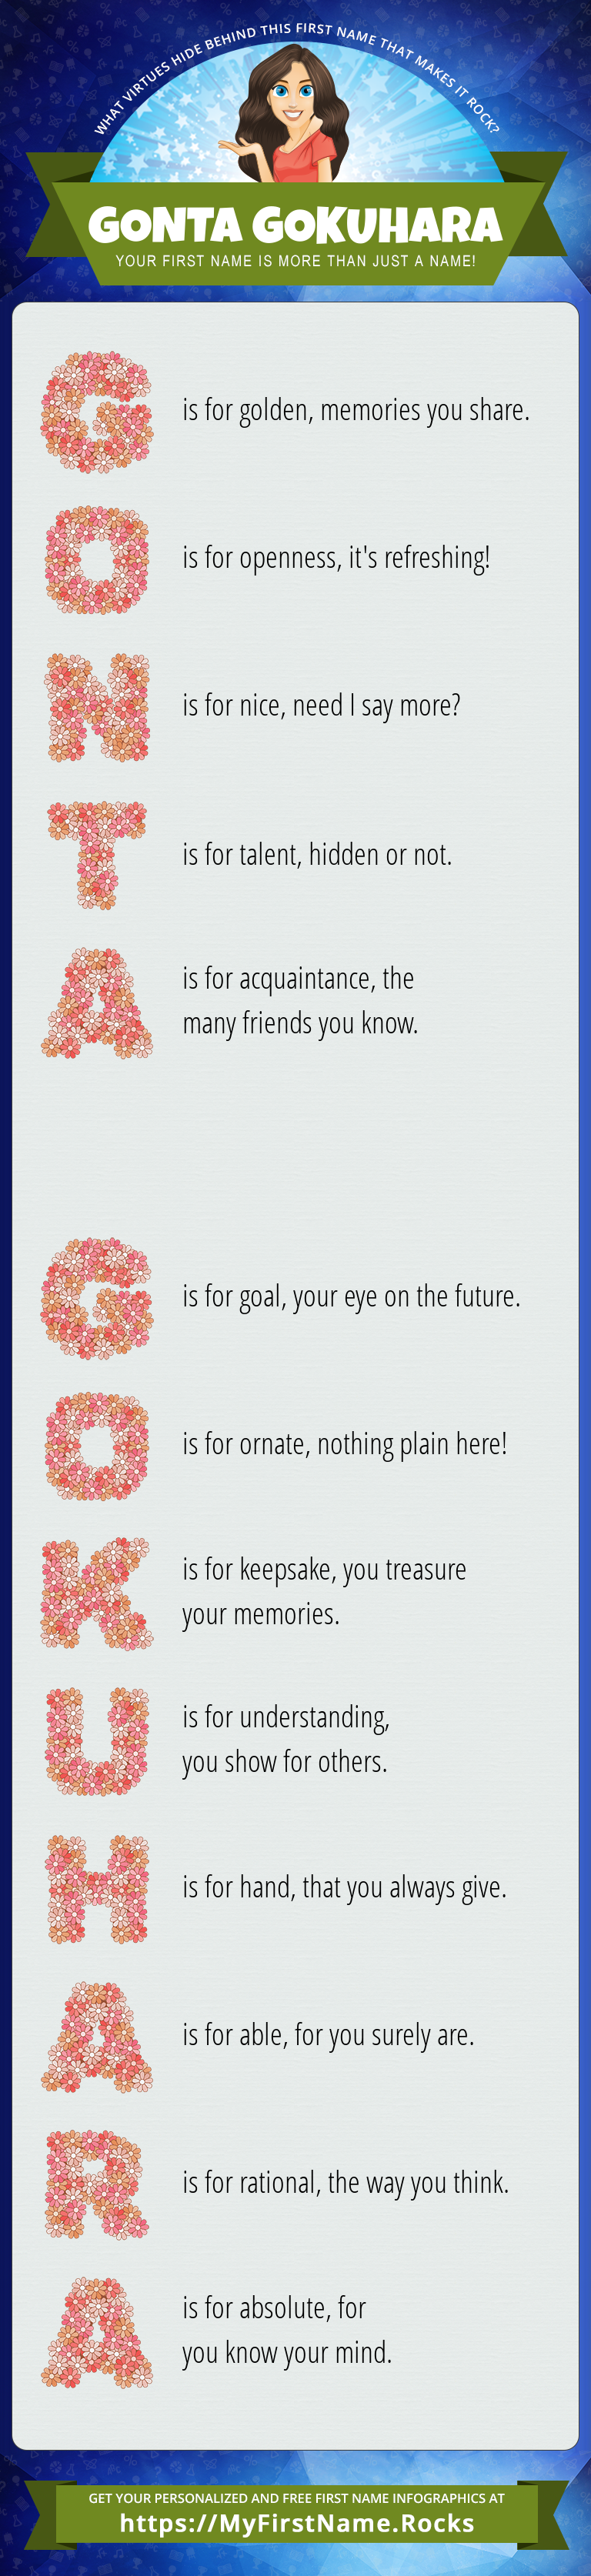 Gonta Gokuhara Infographics